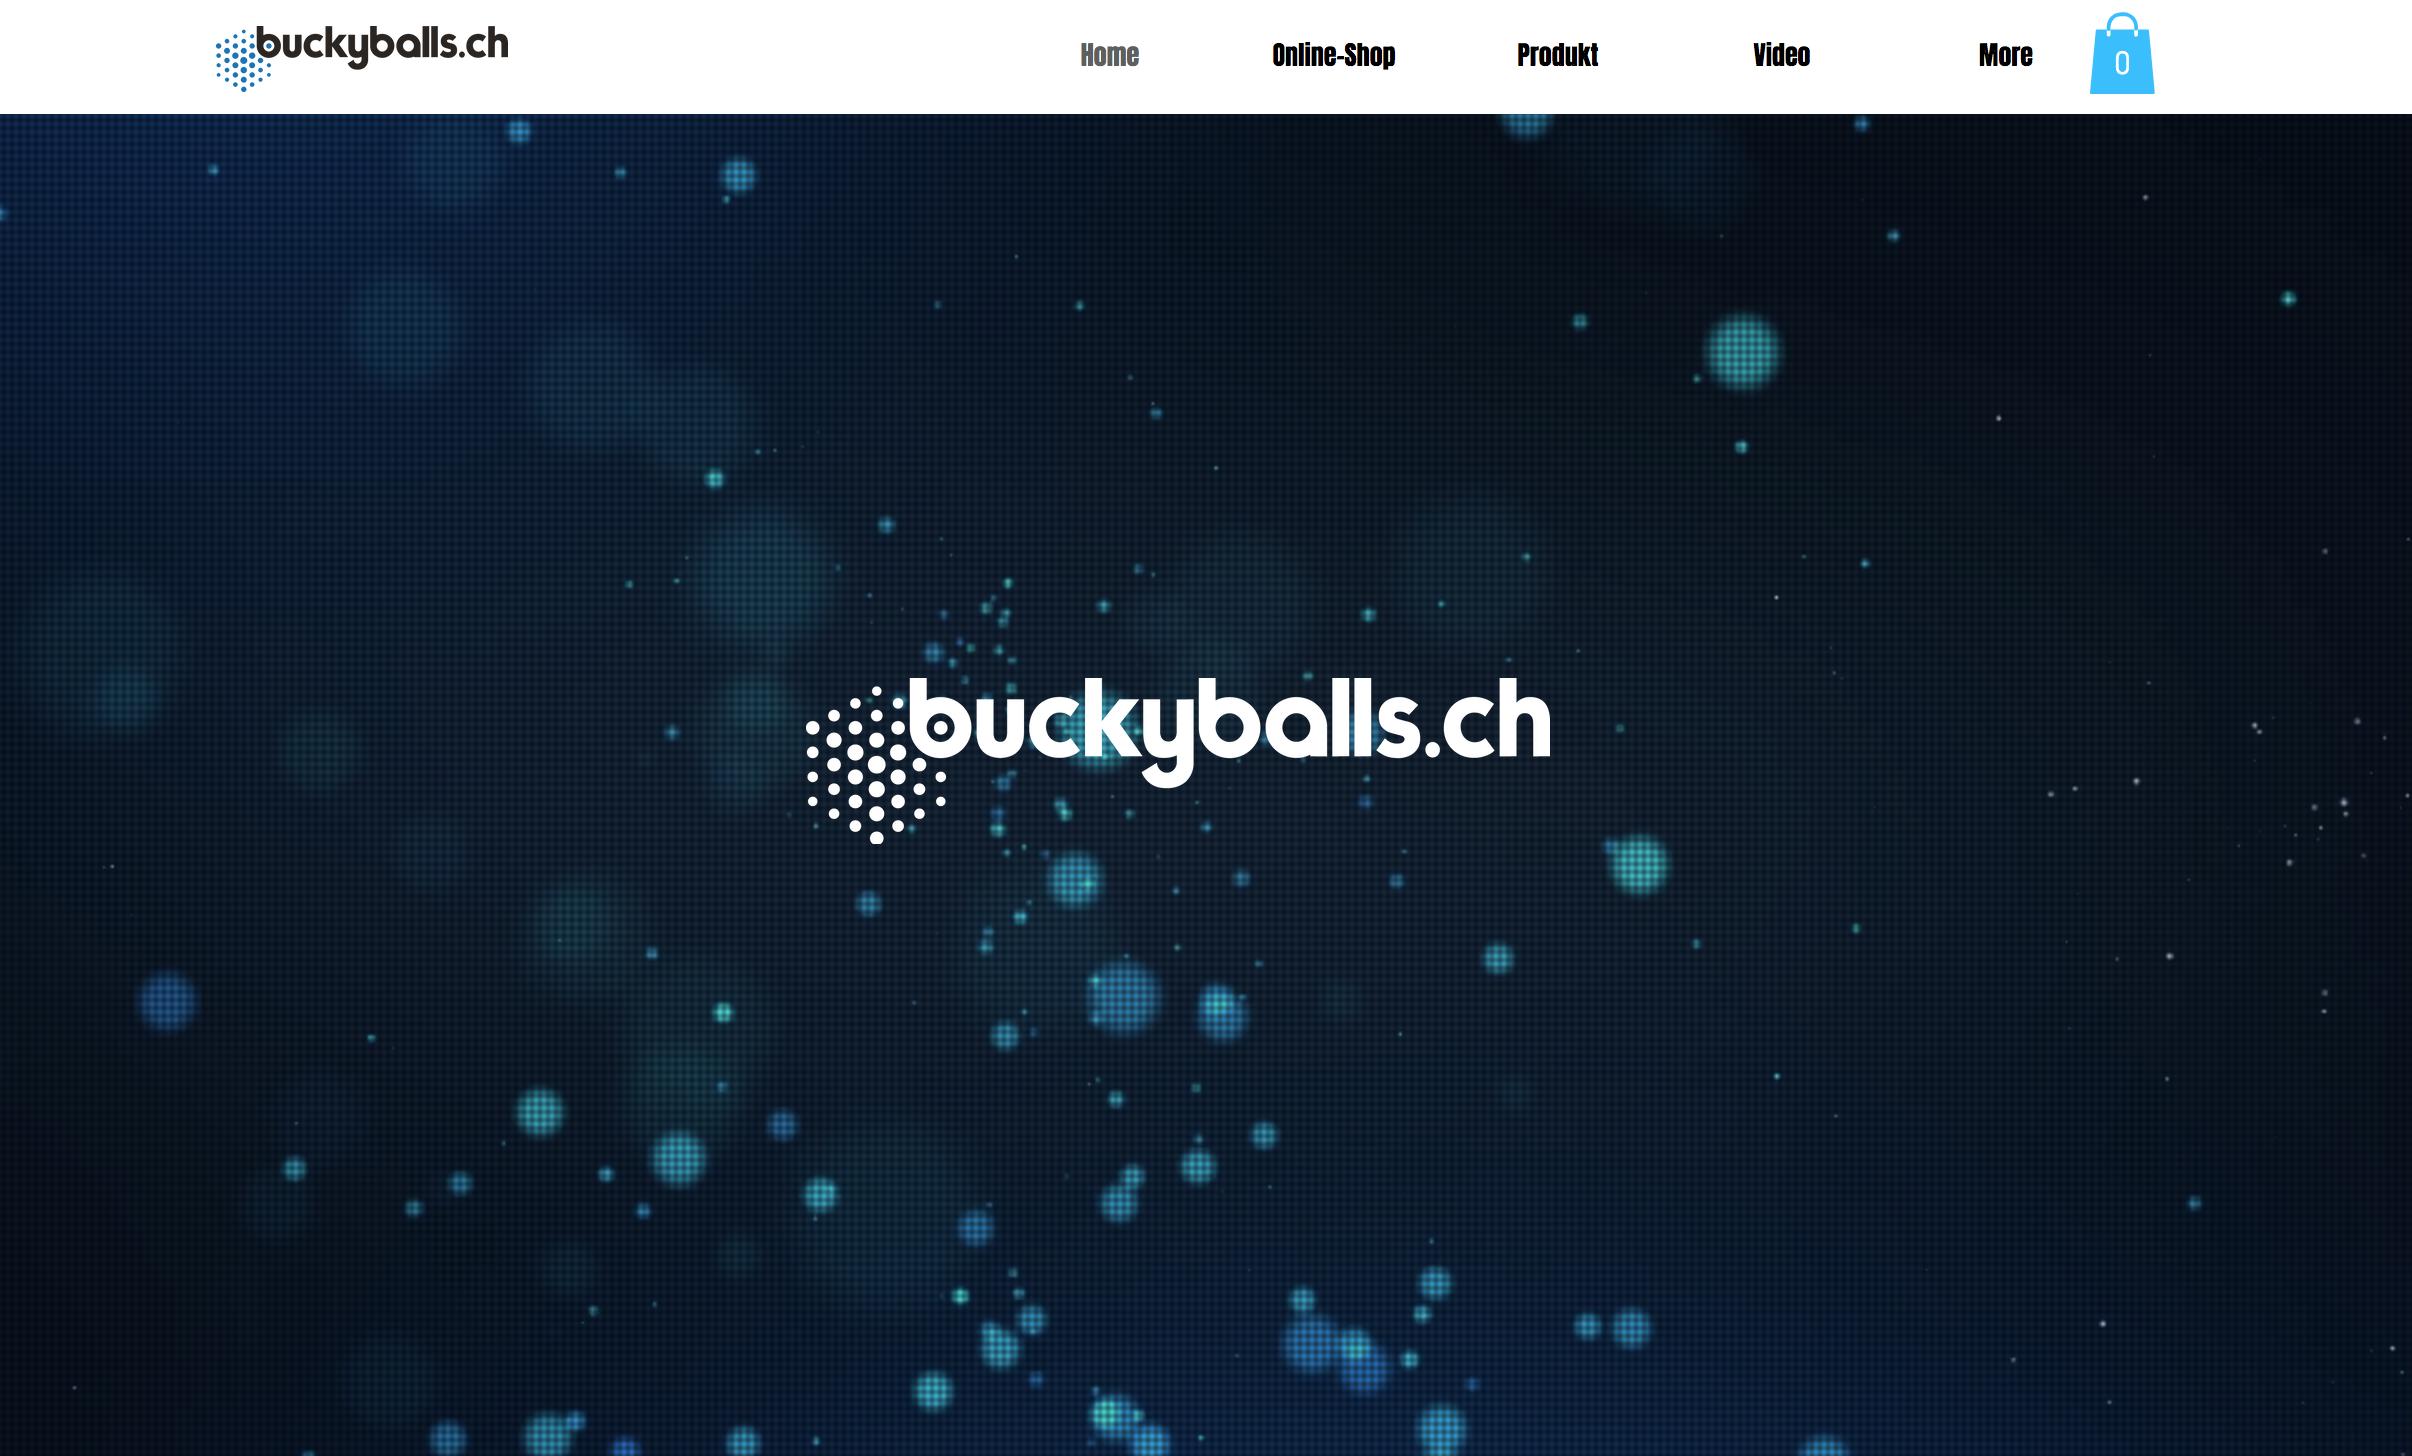 buckyballs.ch